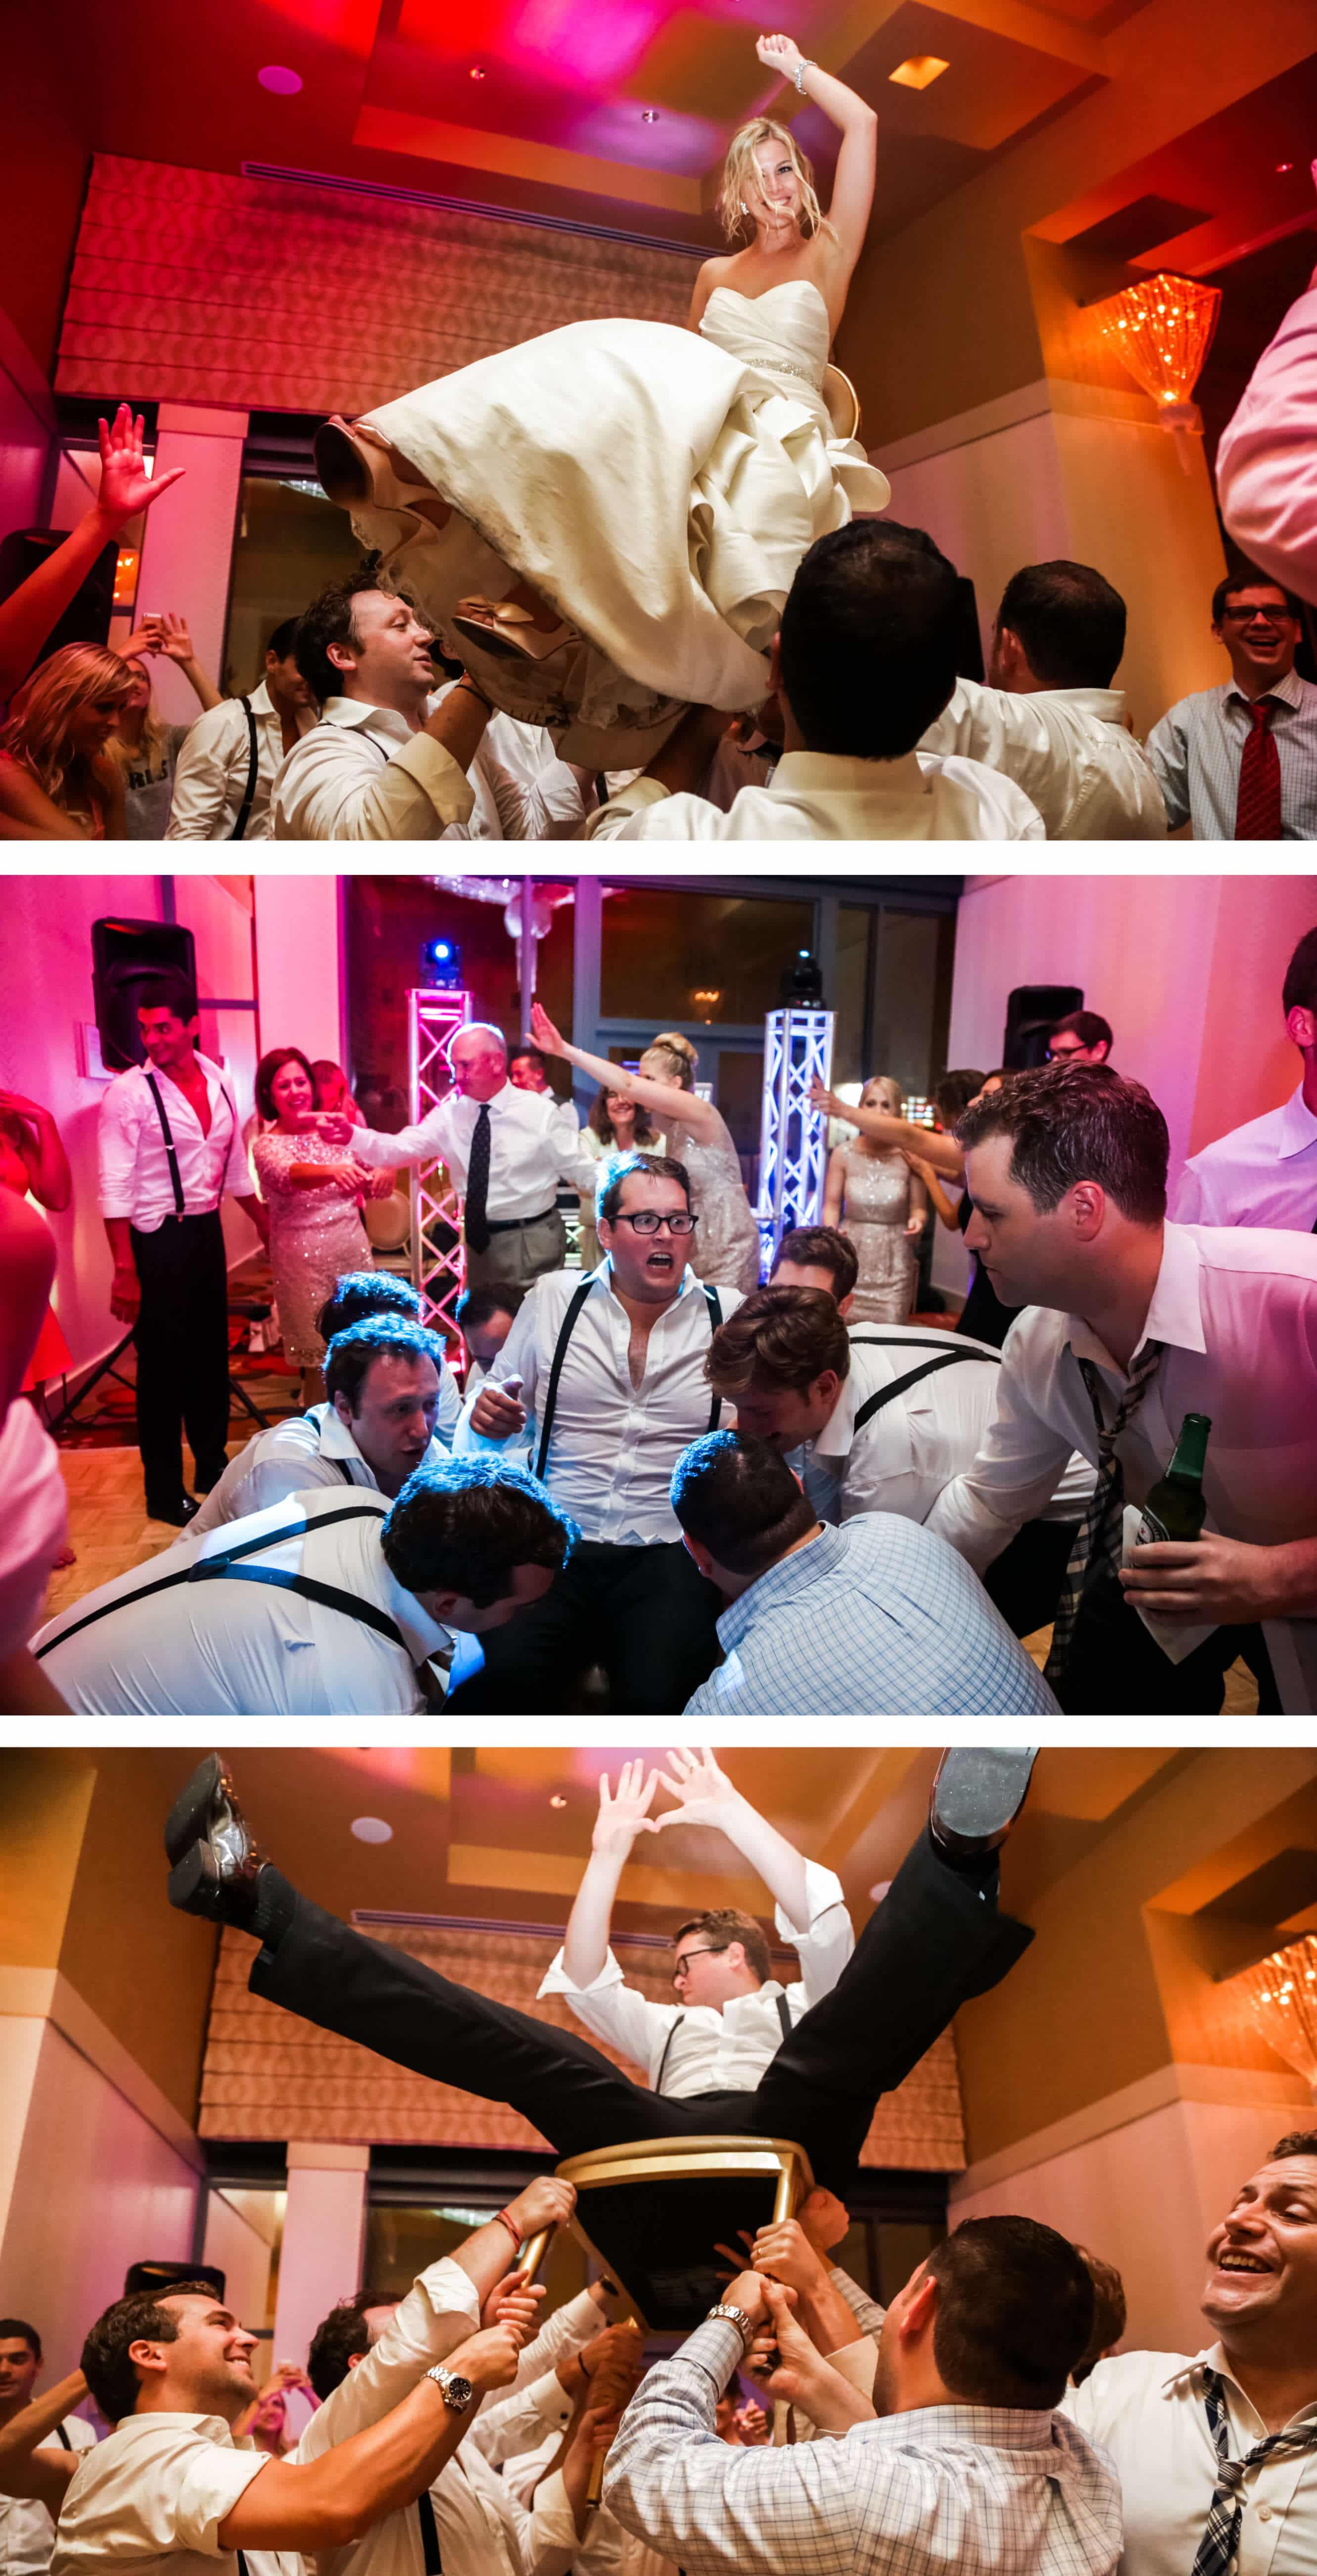 Kimpton Hotel Palomar Horah dance - Sussex wedding photographer